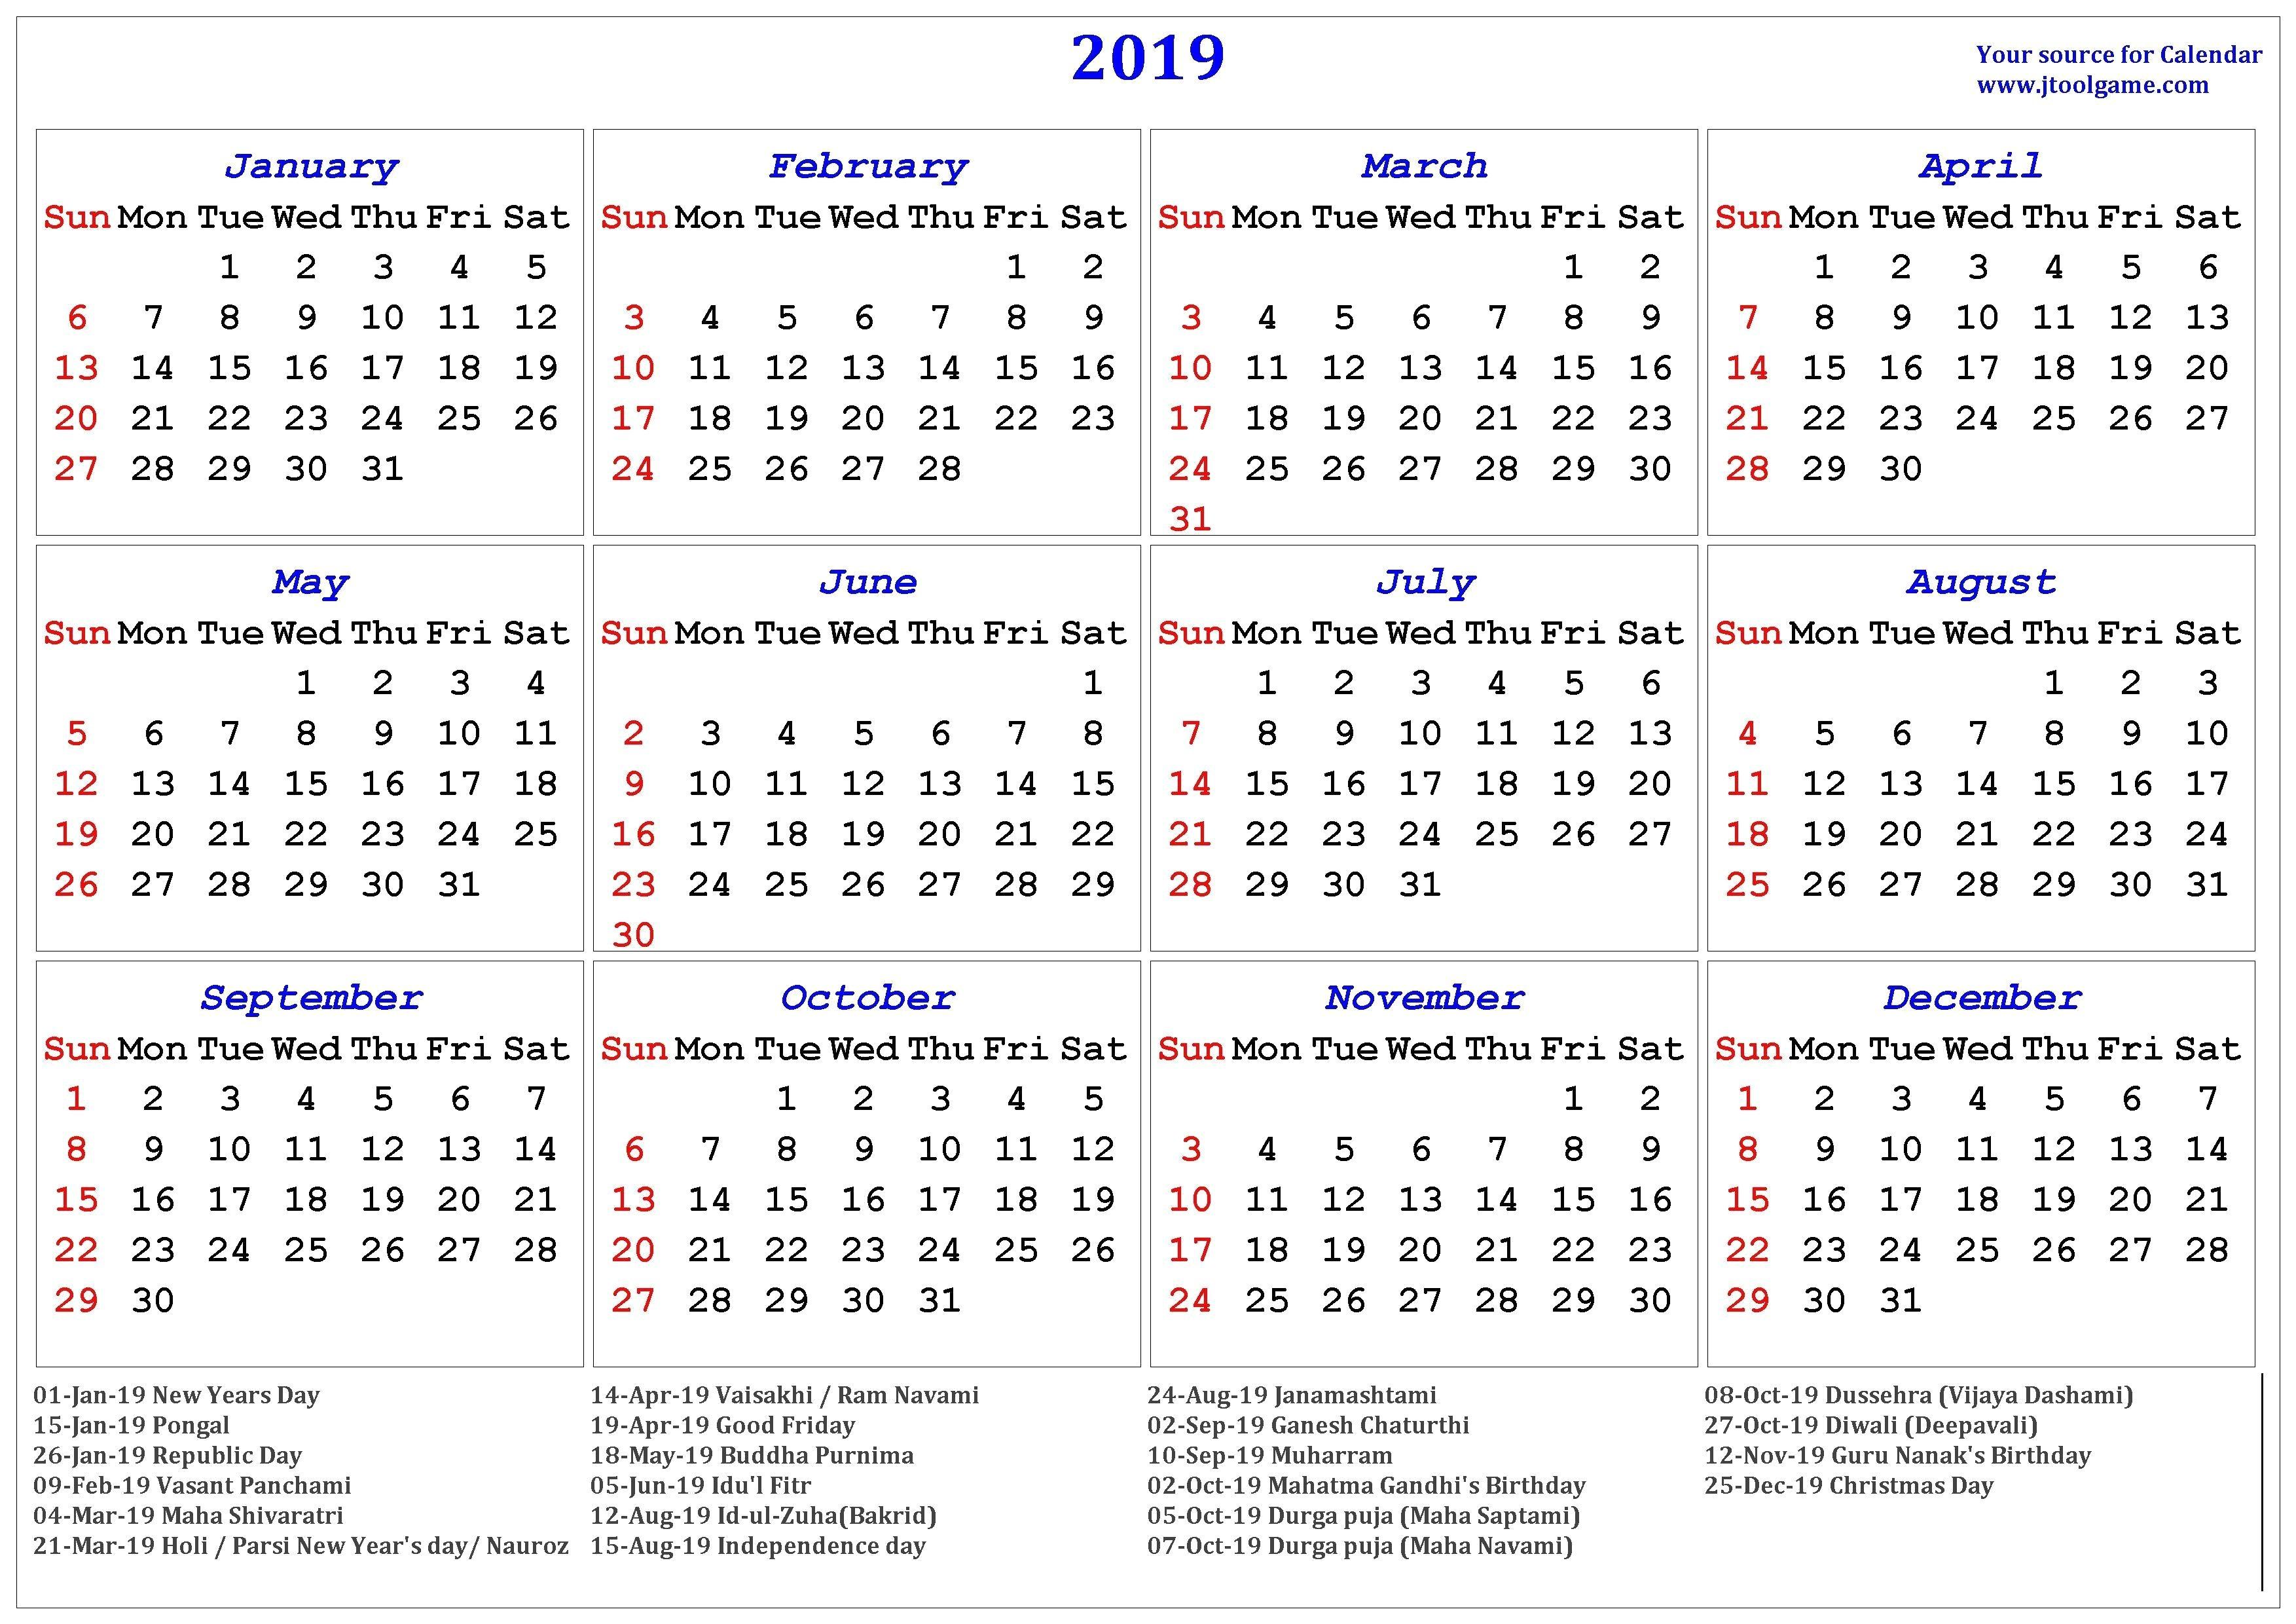 Hindu Calendar 2019 | Jcreview-January 2020 Calendar Pongal